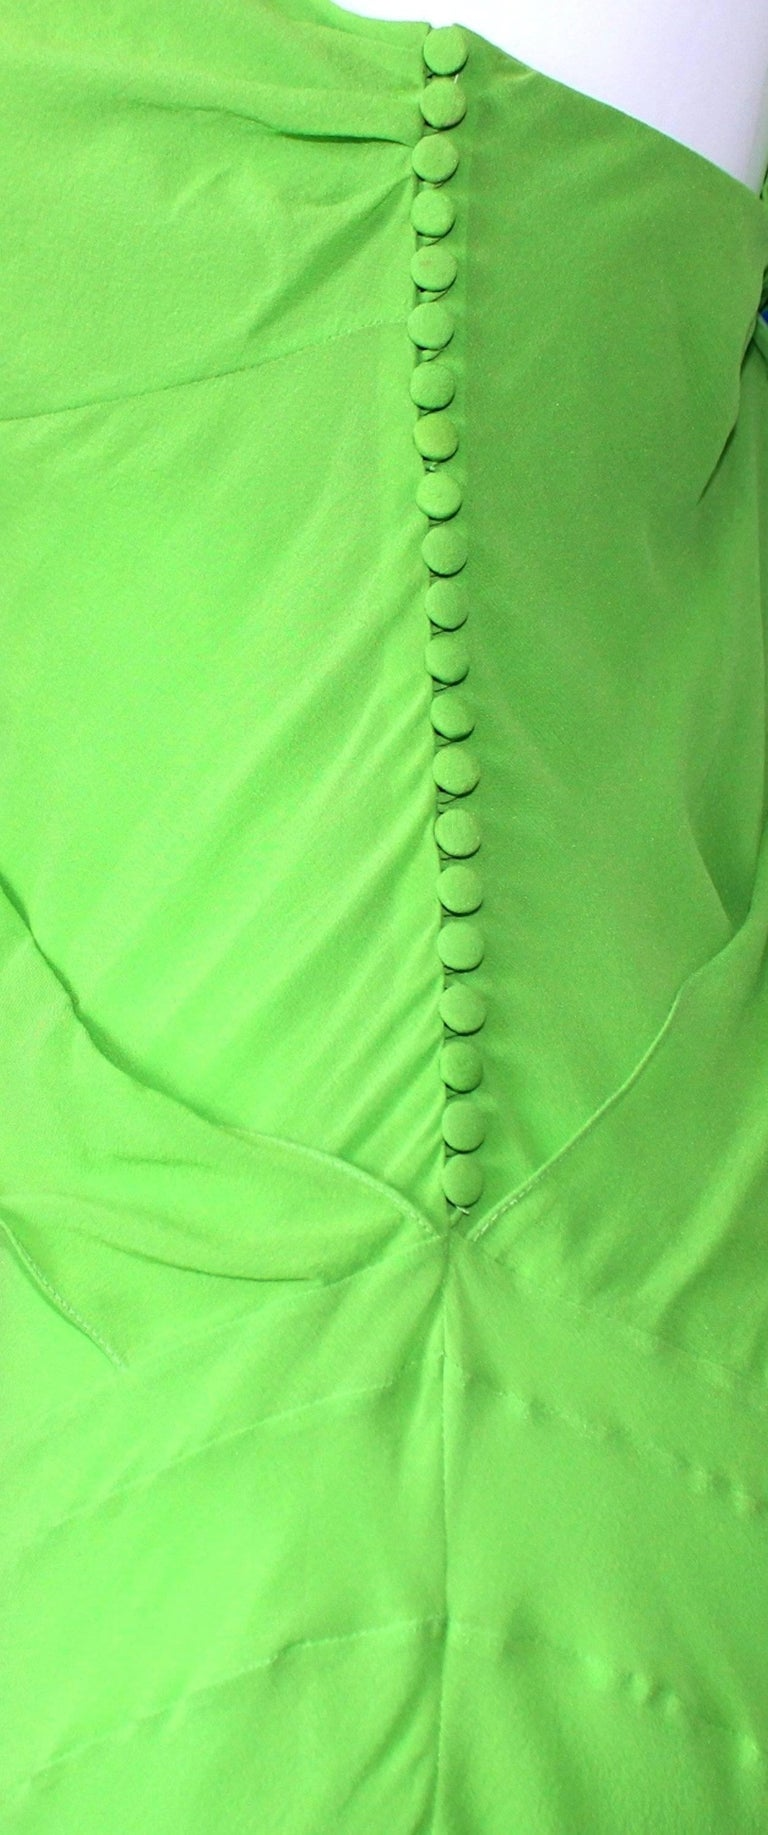 Women's UNWORN Christian Dior by John Galliano Green Draped Silk Chiffon Dress Gown For Sale